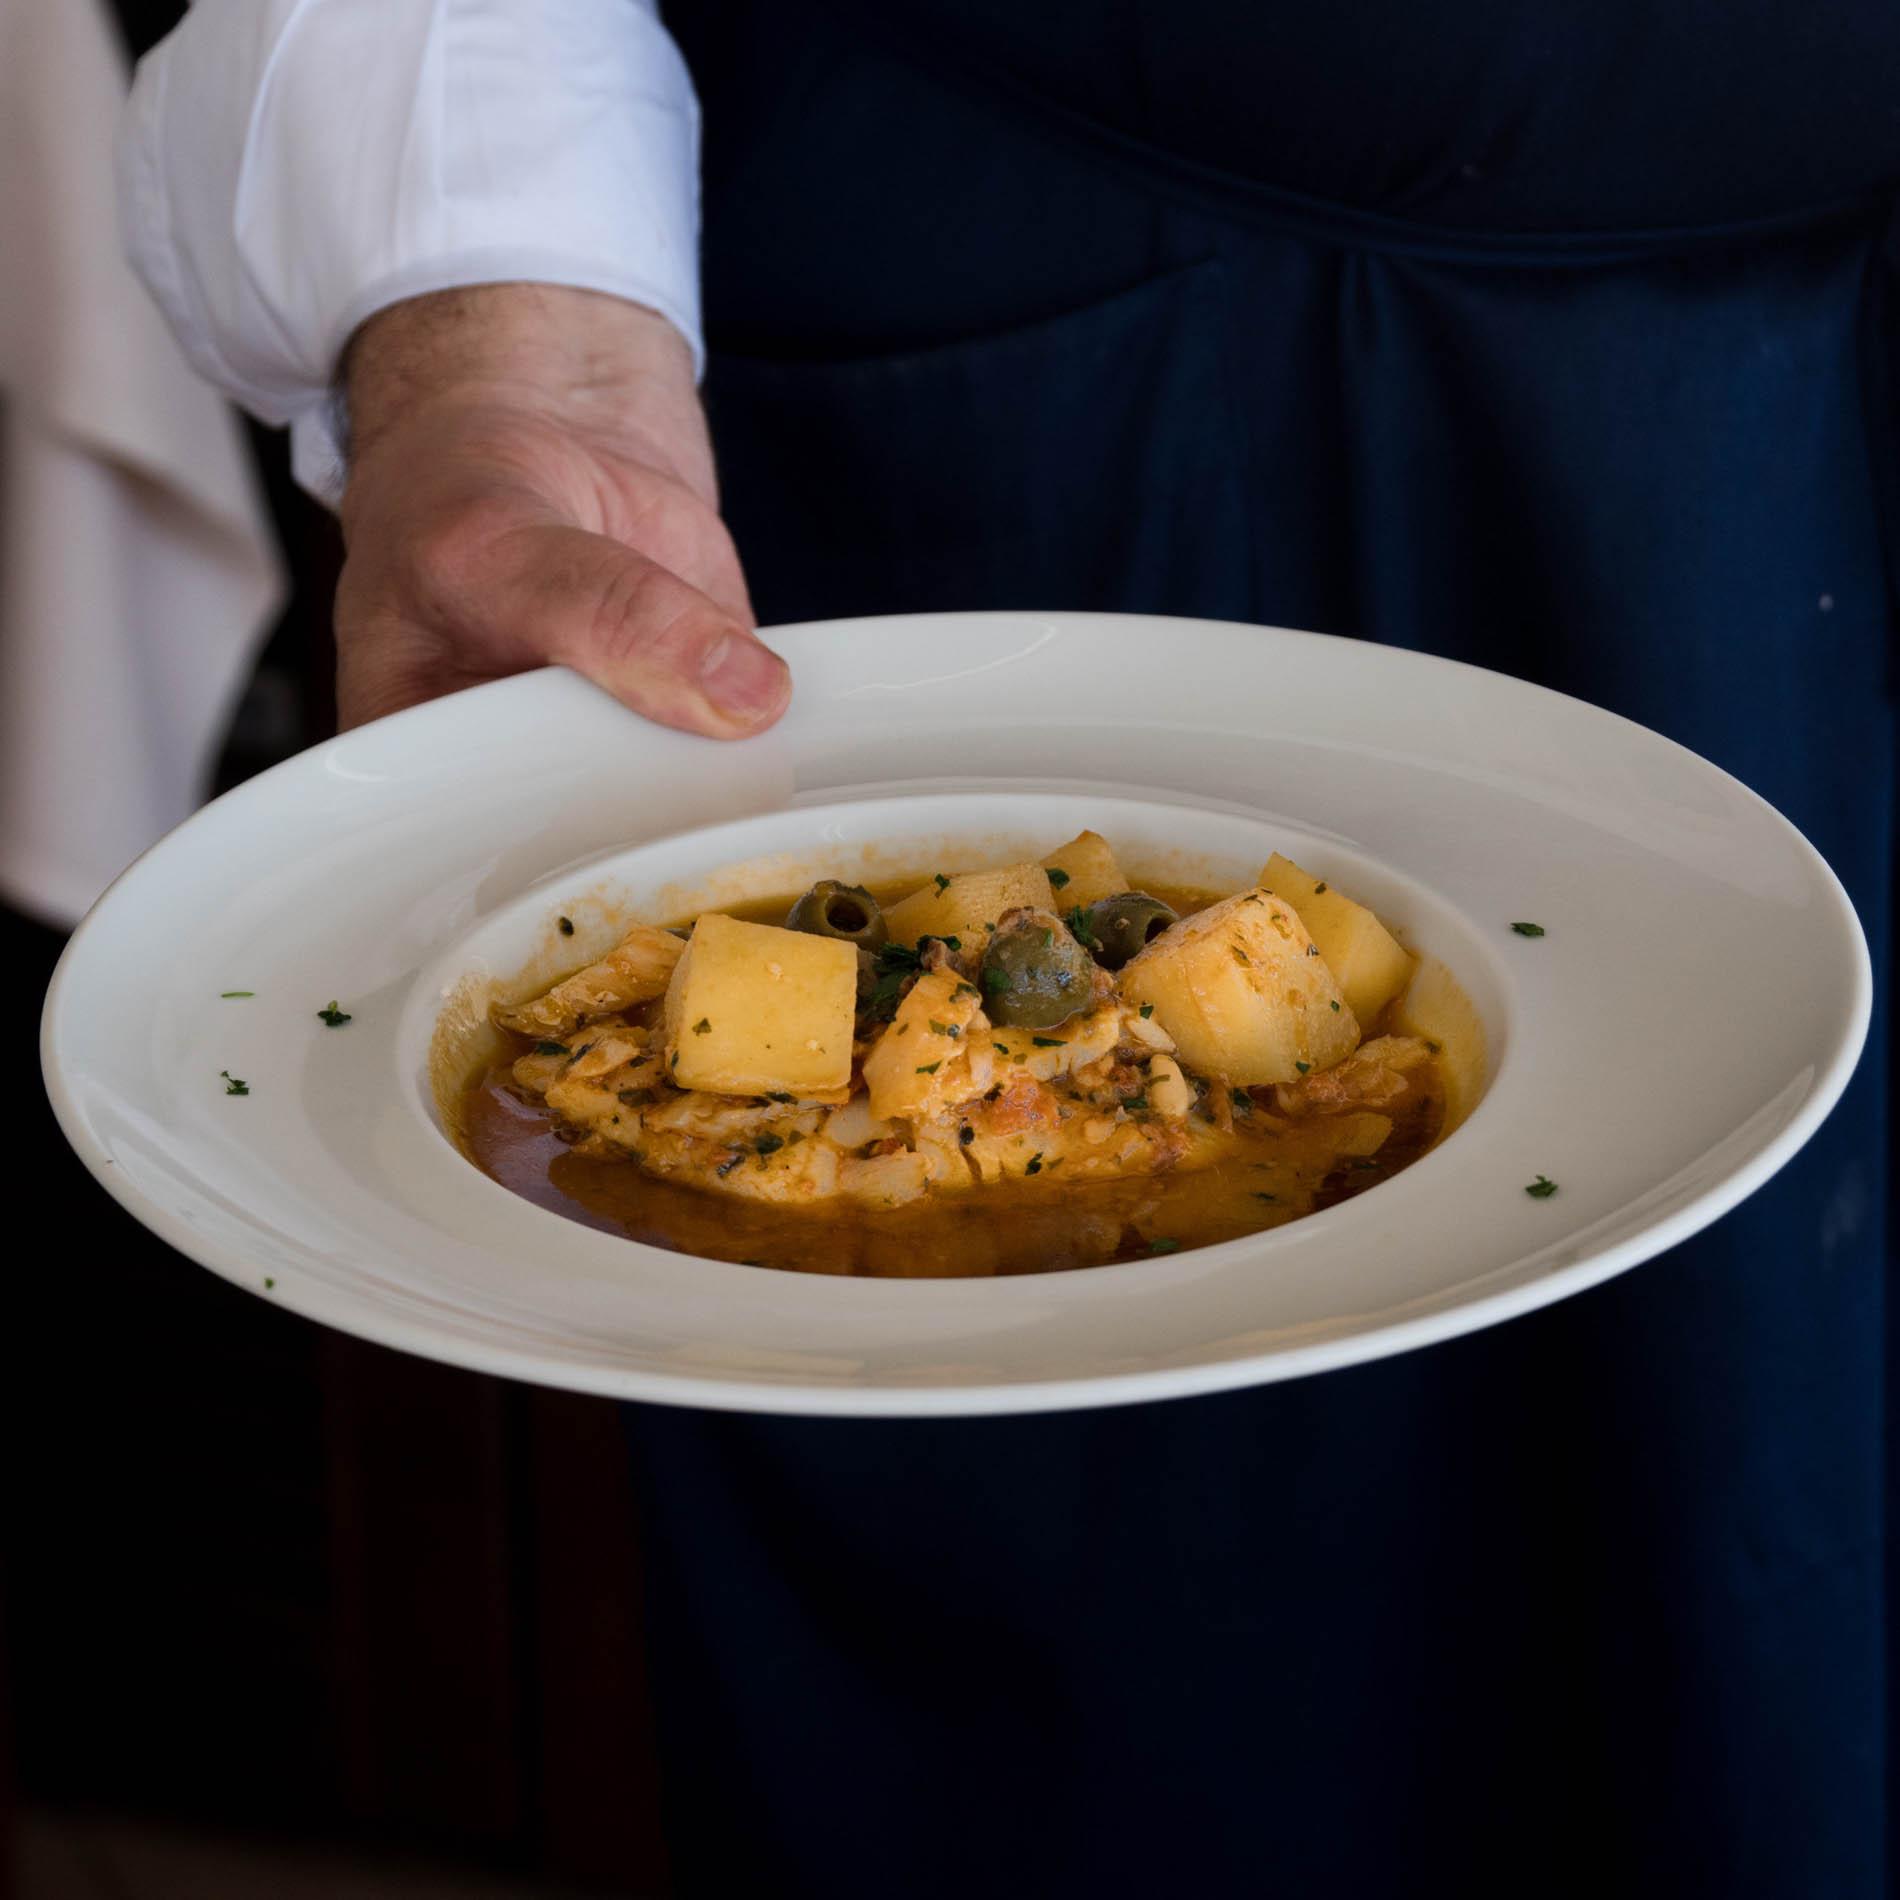 la-piedigrotta-ristorante-da-carmine-e-antonio-205